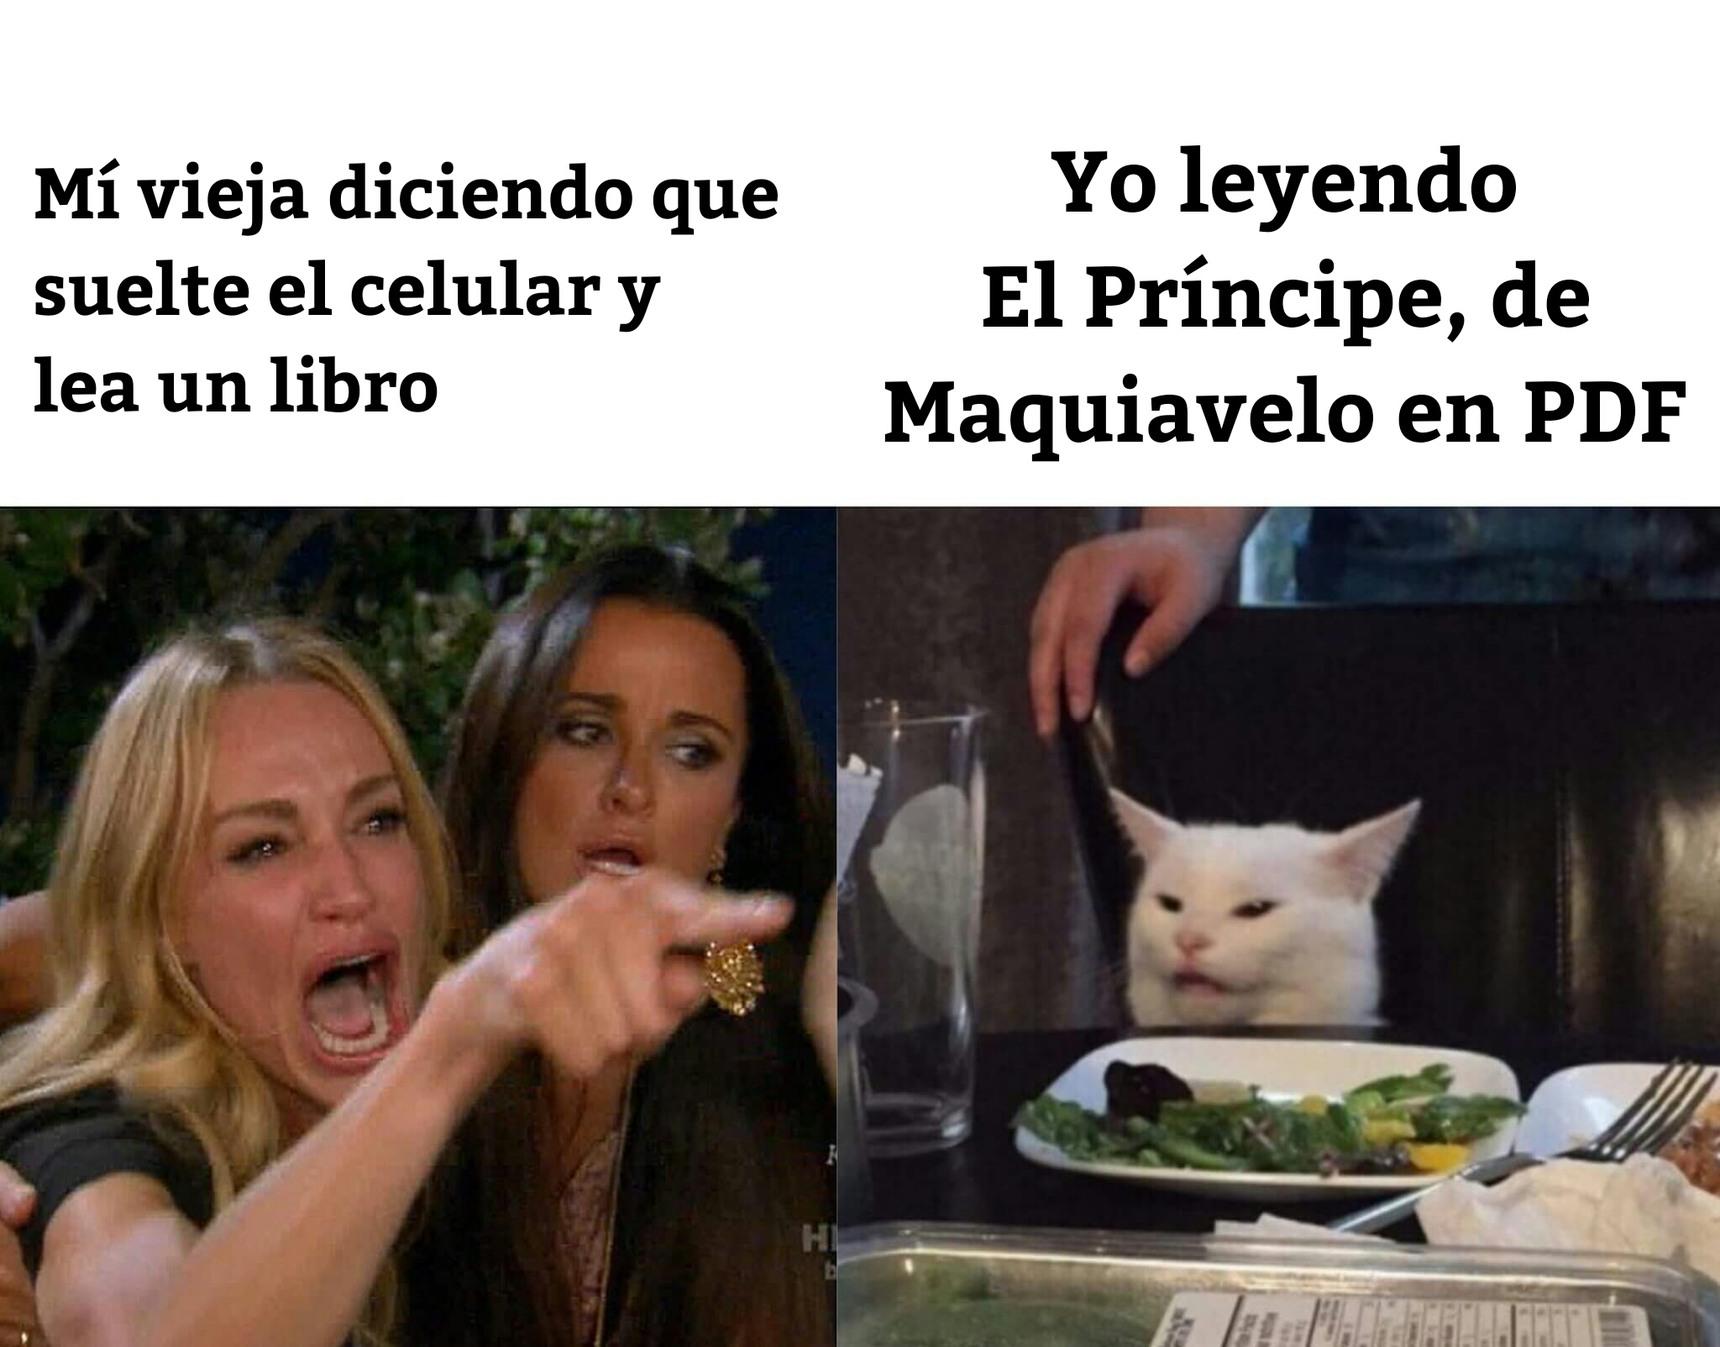 La_tipiKirchner - meme